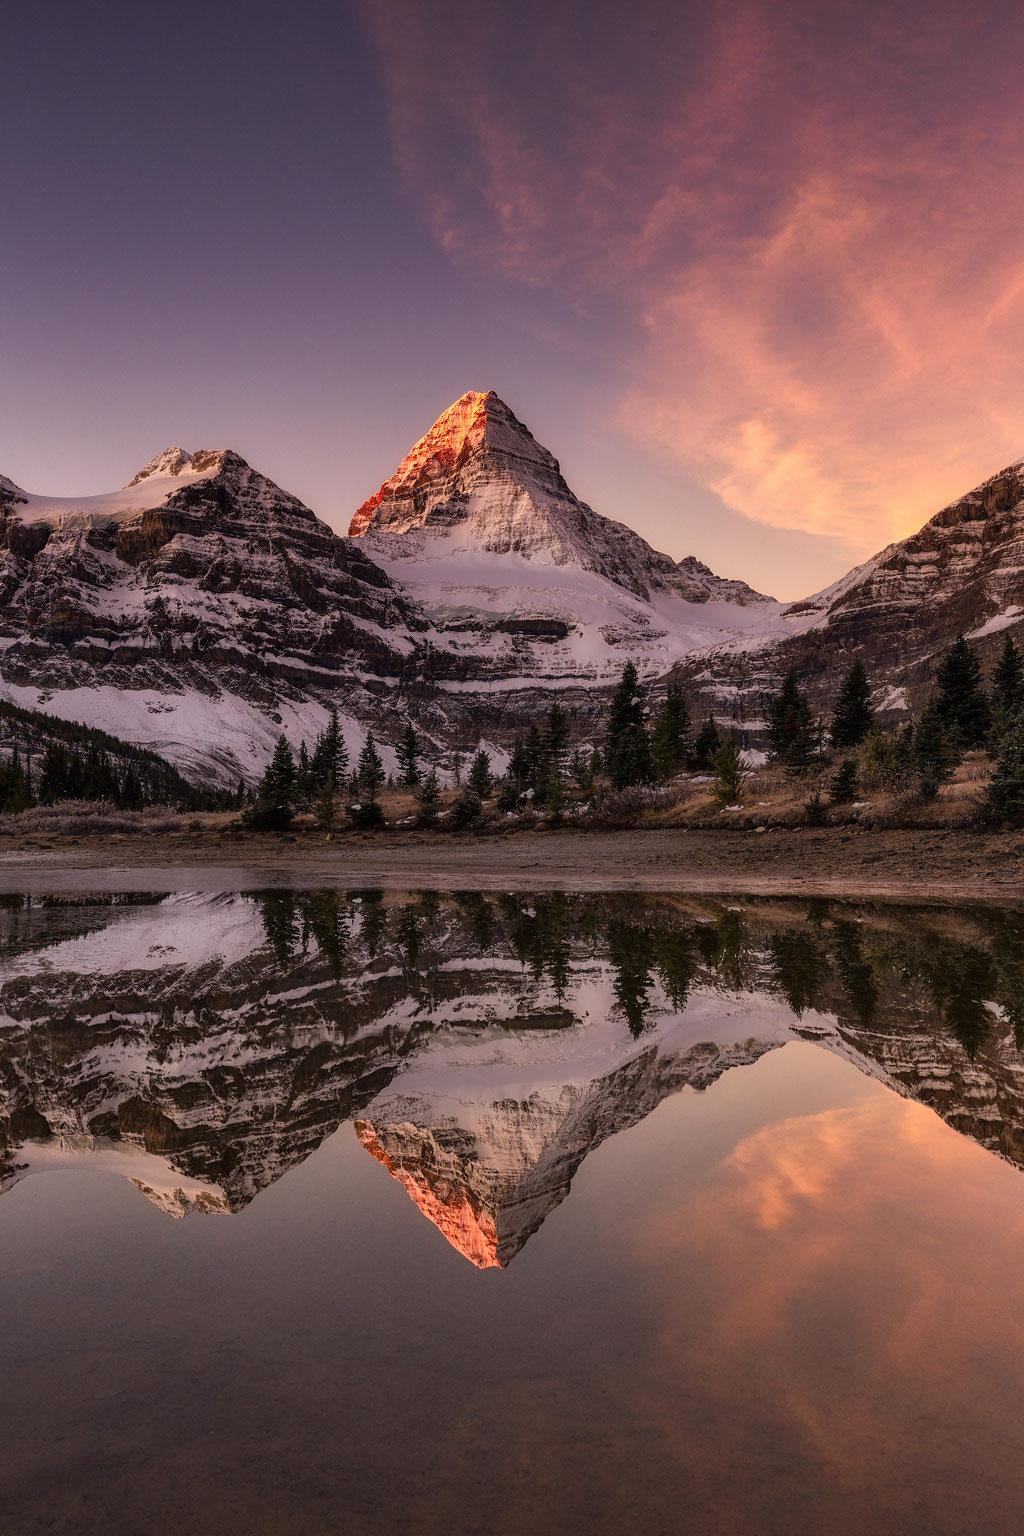 Sunrise reflections of Mount Assiniboine